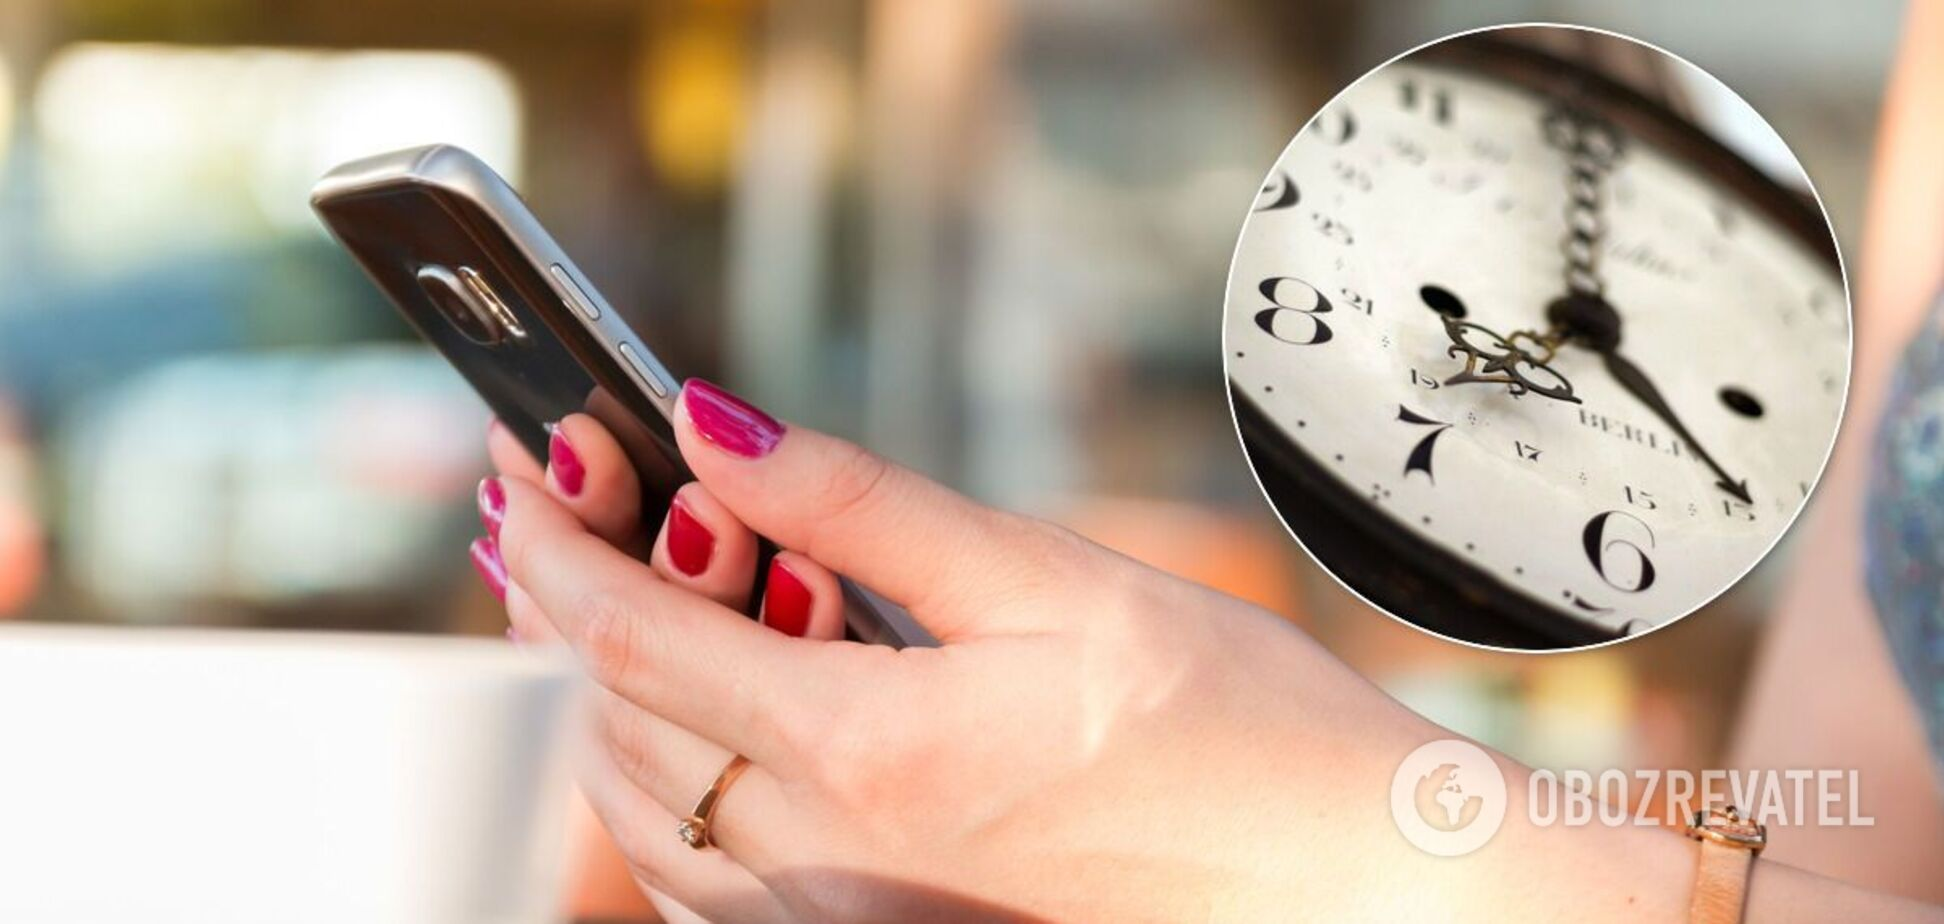 Телефони в основному переходять на зимовий час автоматично